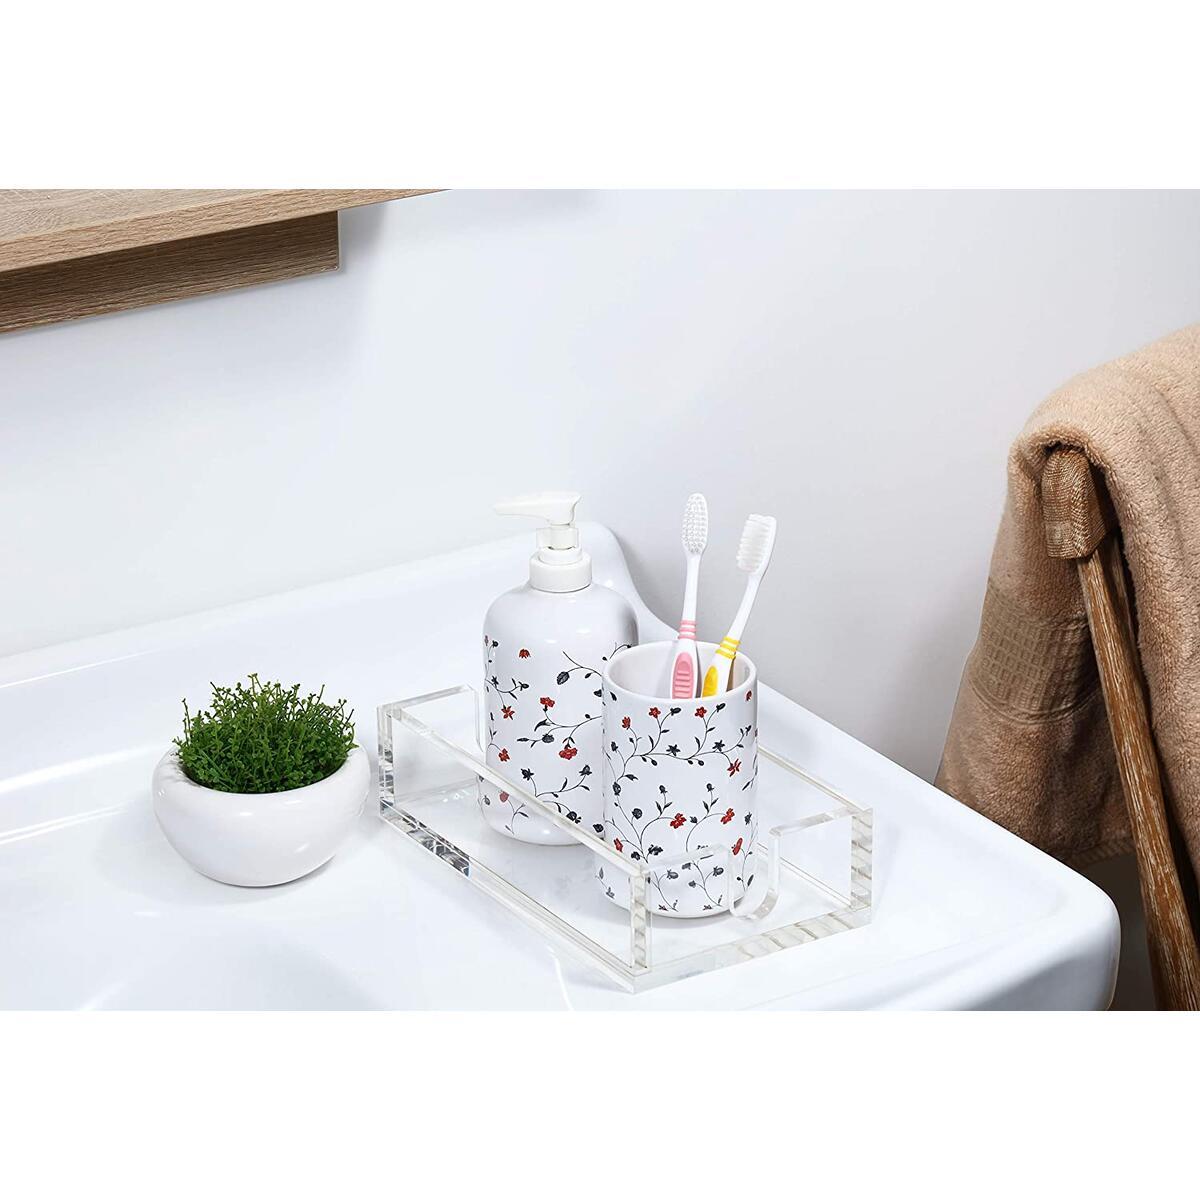 Acrylic Napkin Holder Guest Towel Holder